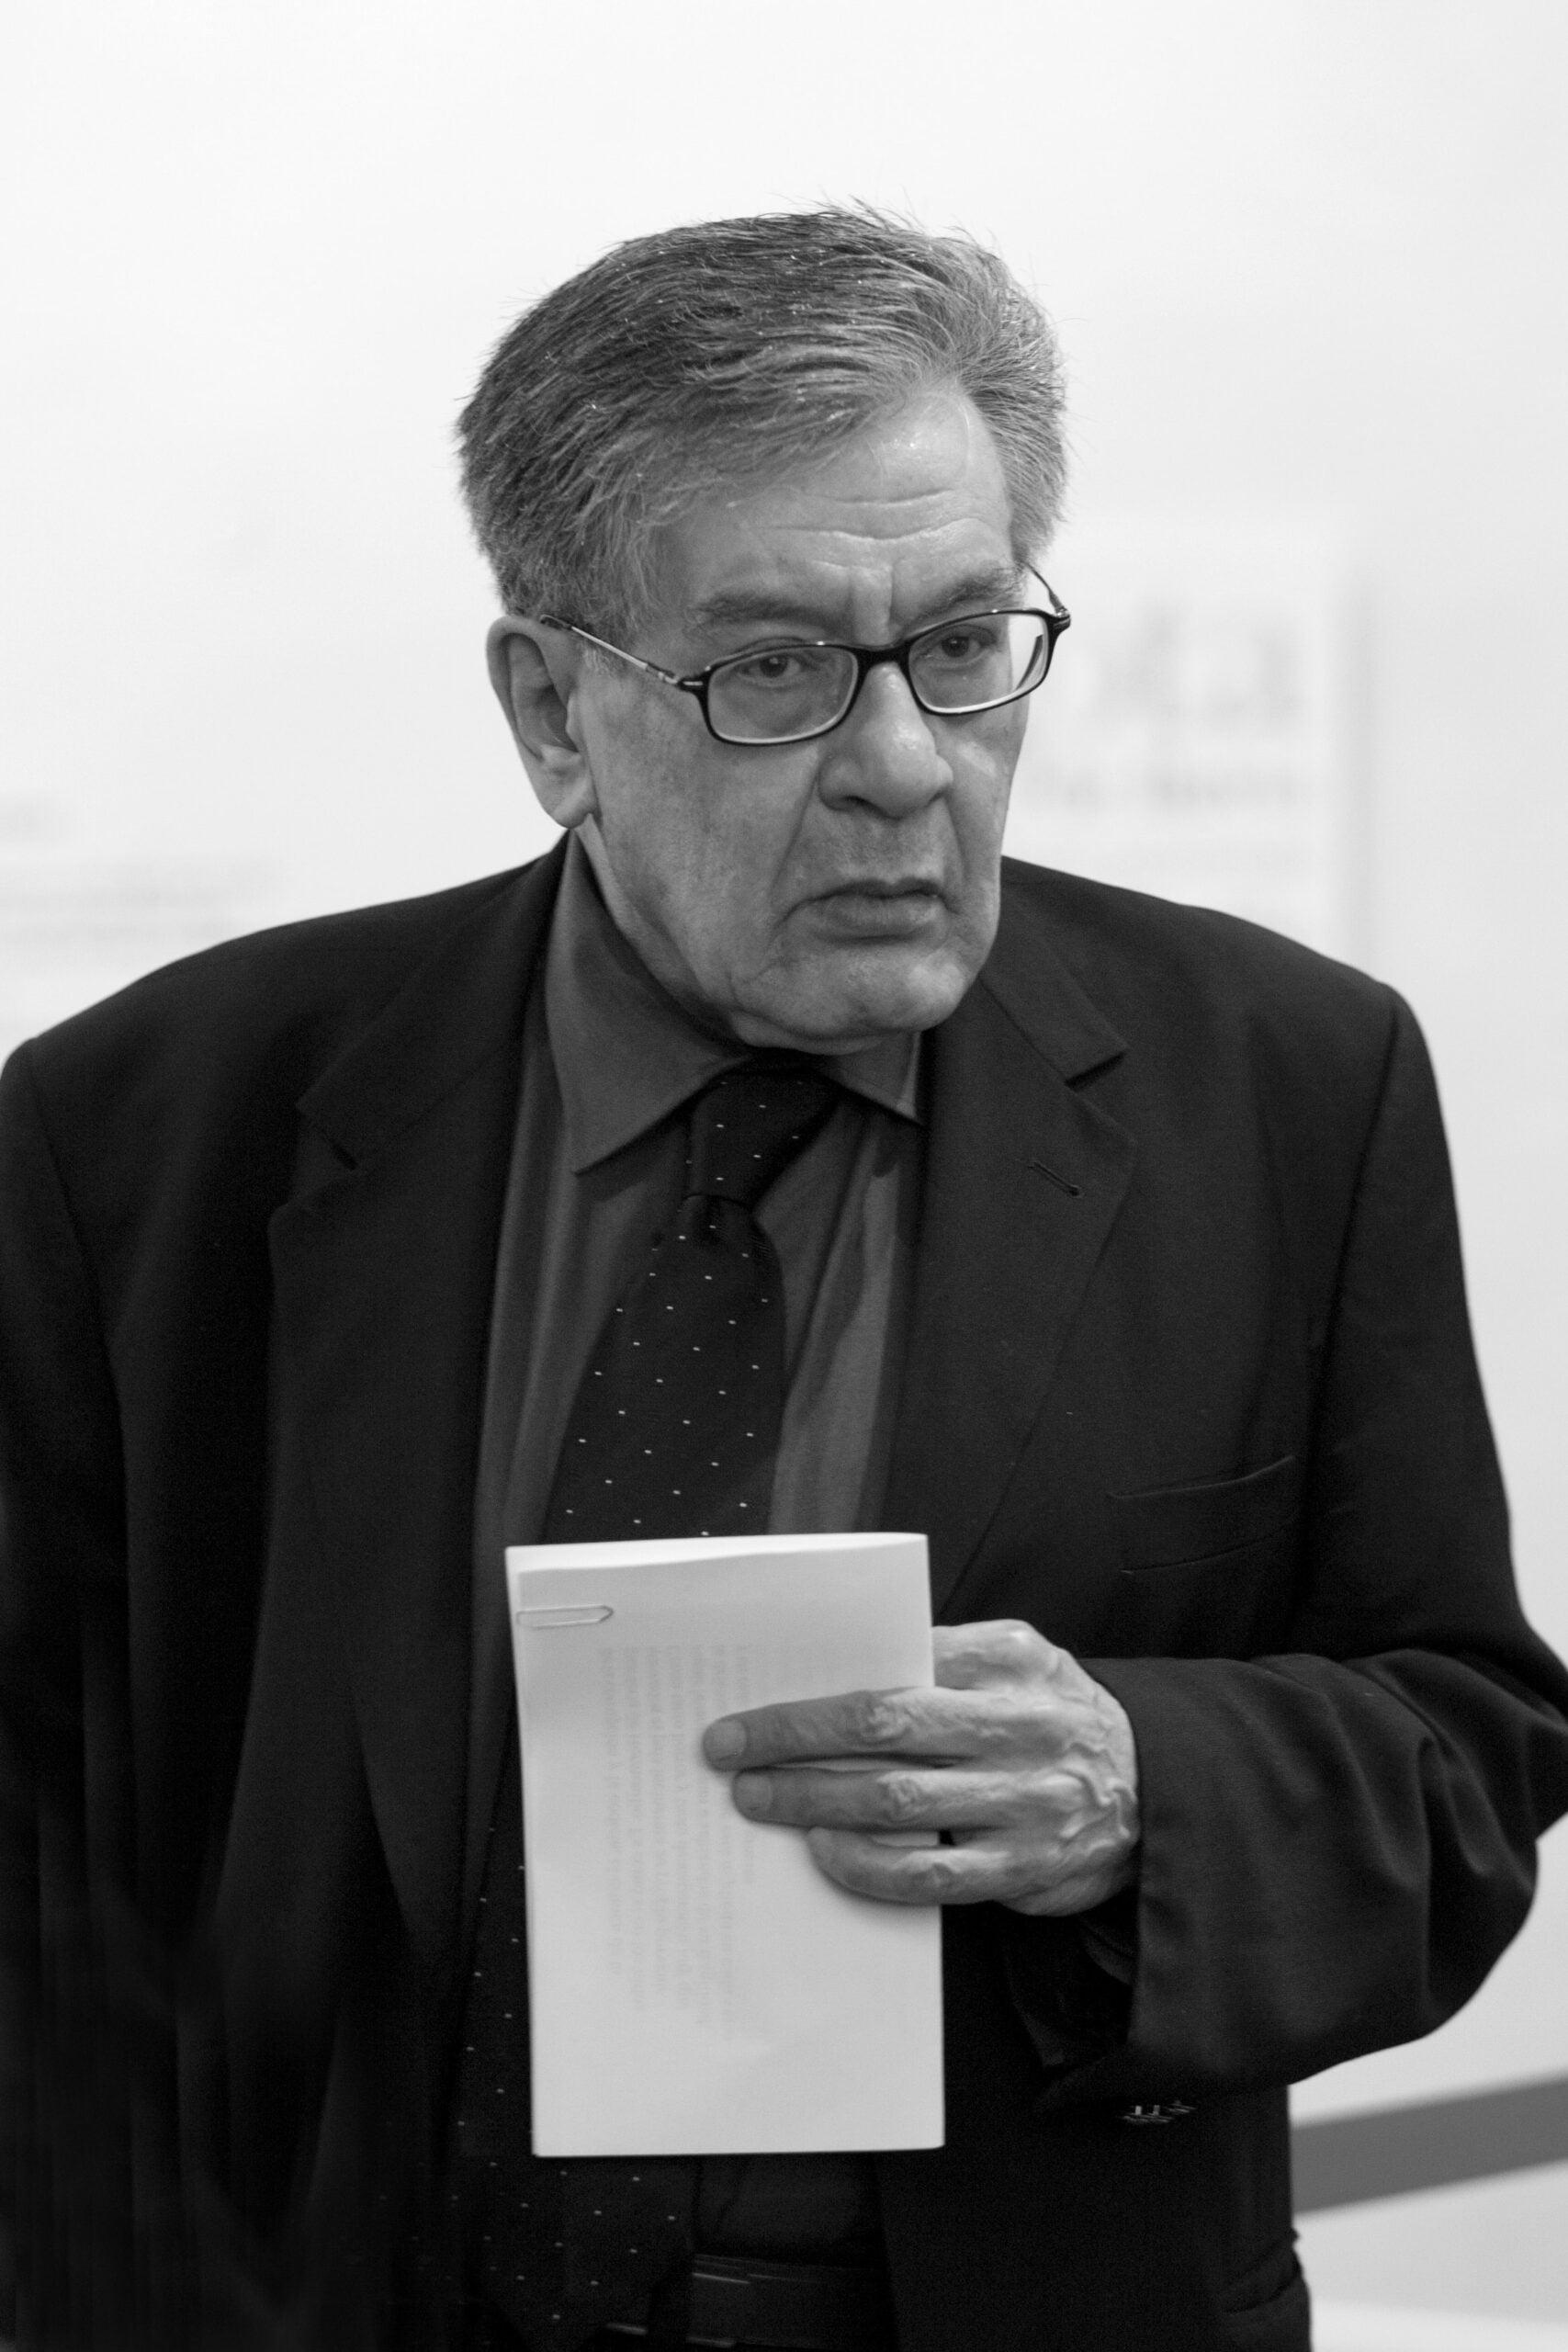 3fd2d74b jose emilio pacheco scaled خوسيه إيميليو باتشيكو: دفاعاً عن مجهوليّة اسم المؤلّف